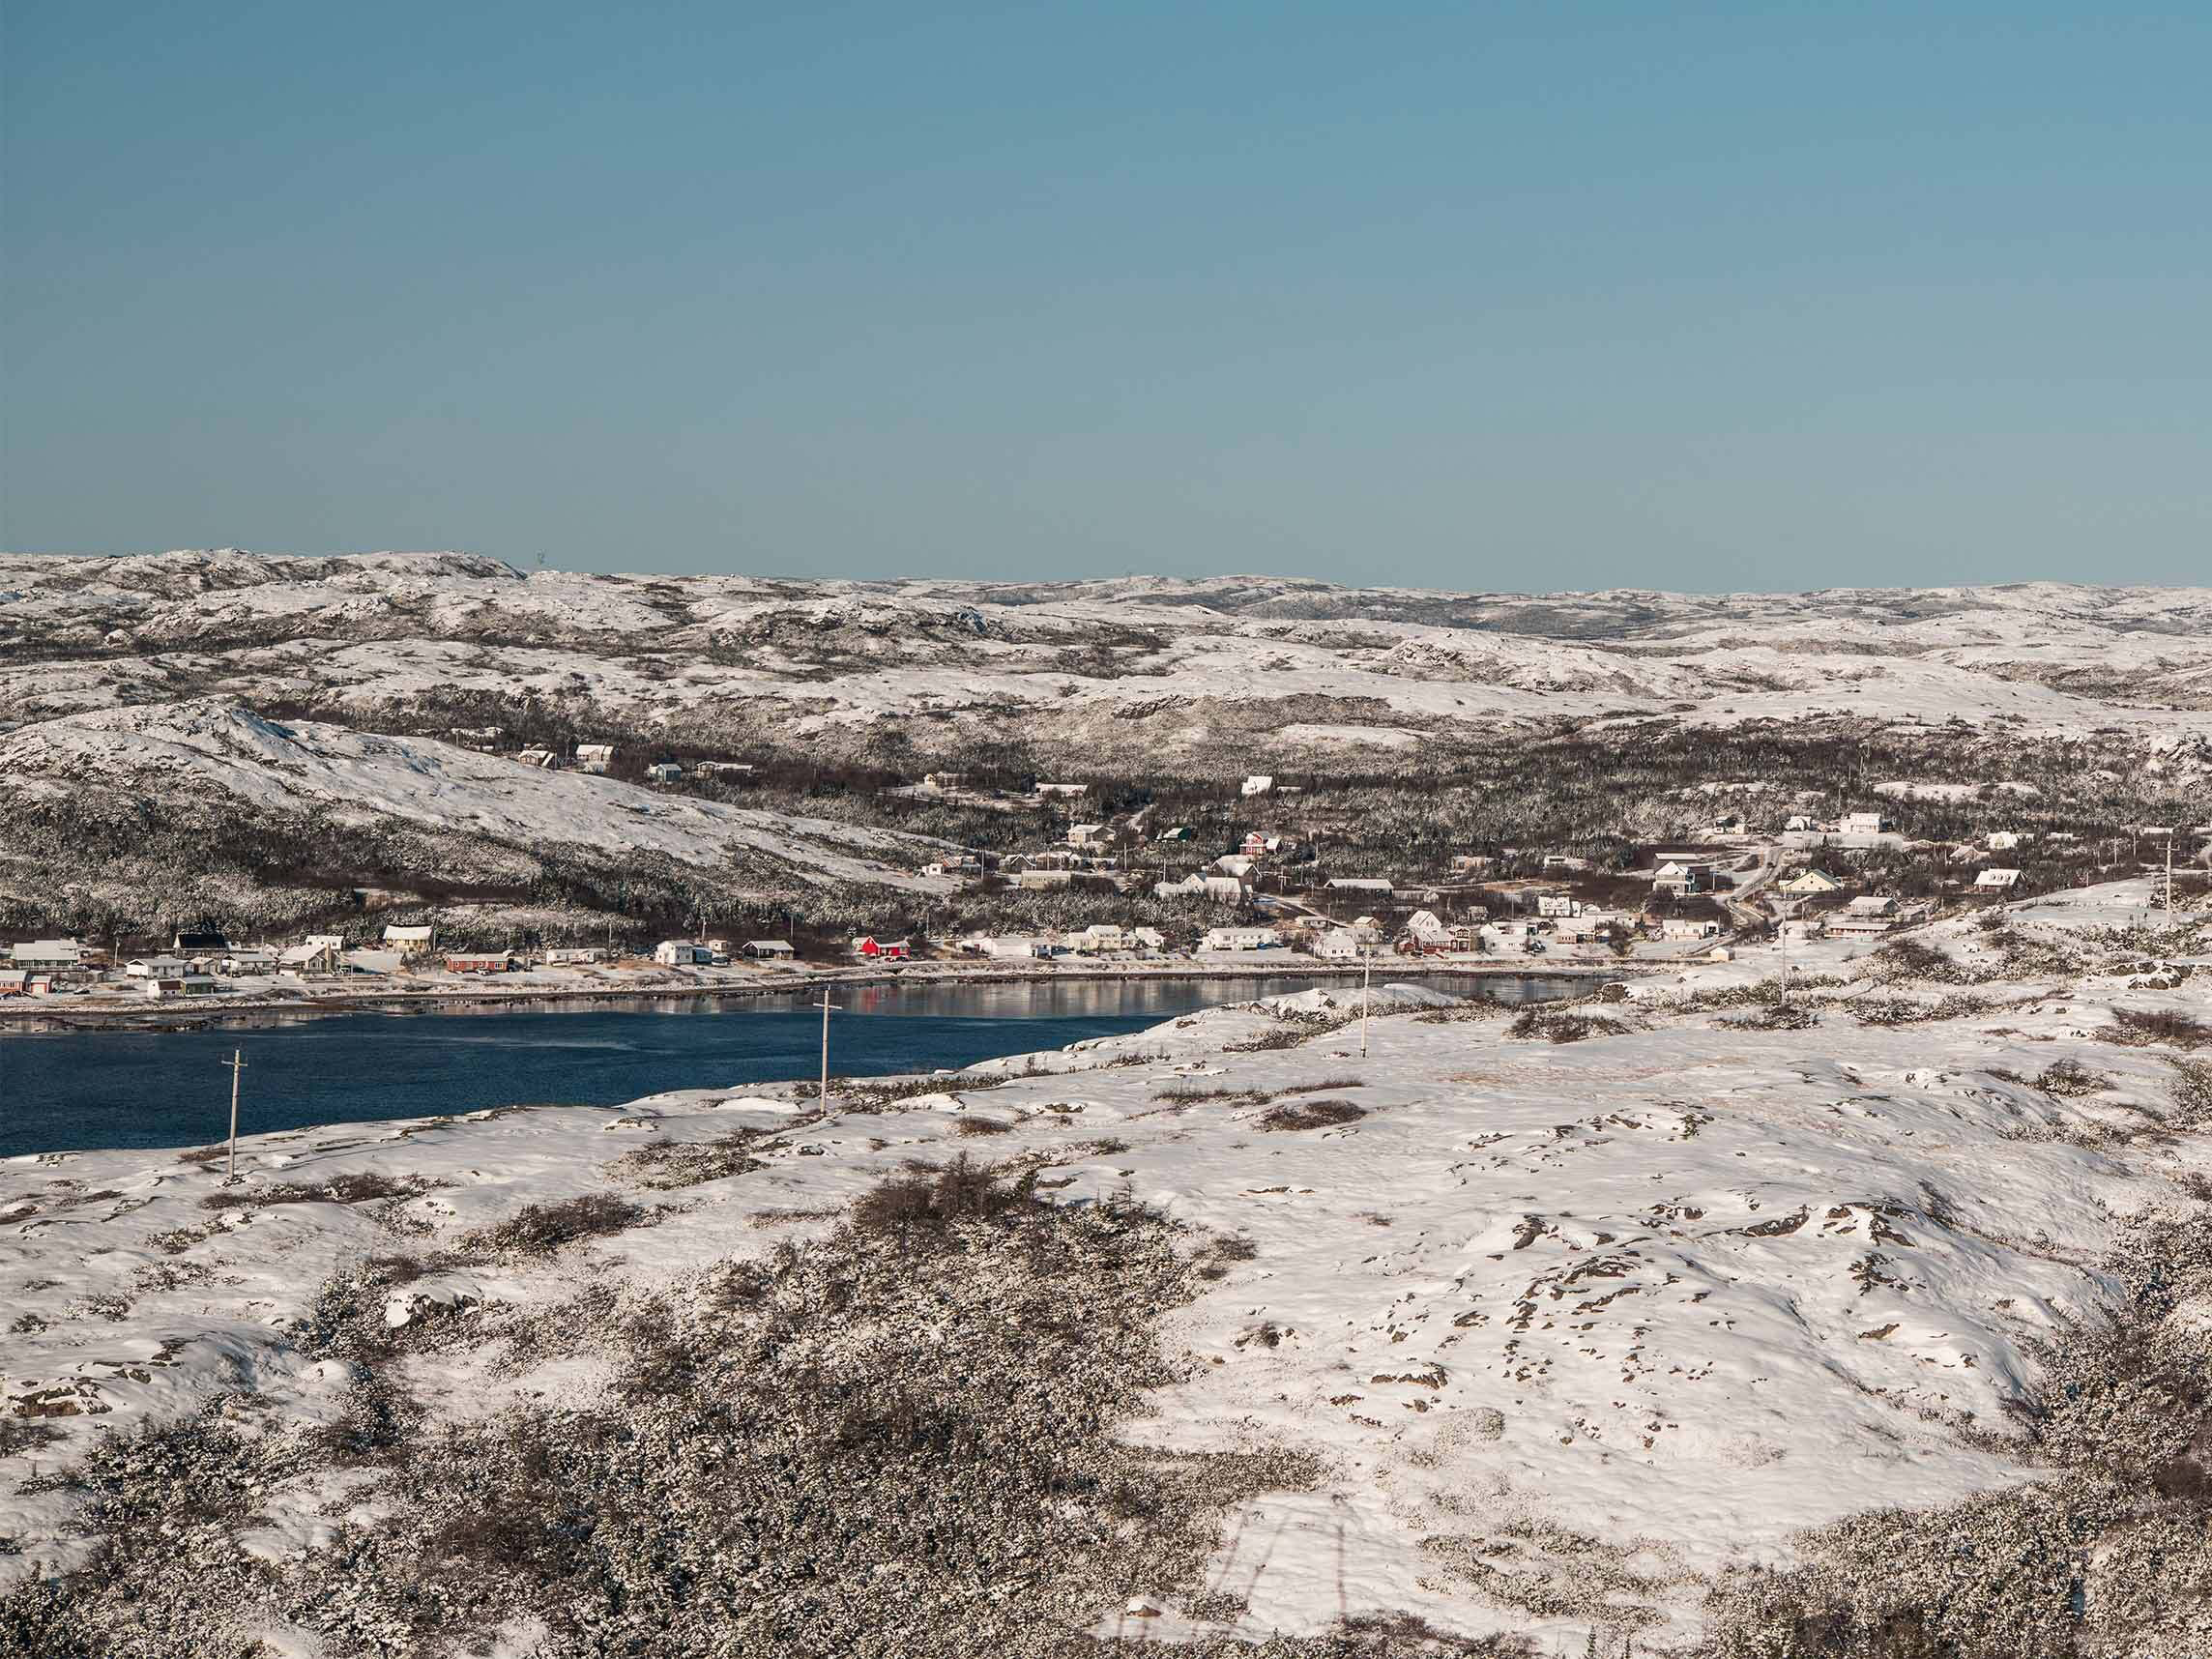 The remote Quebec community of Bonne Esperance